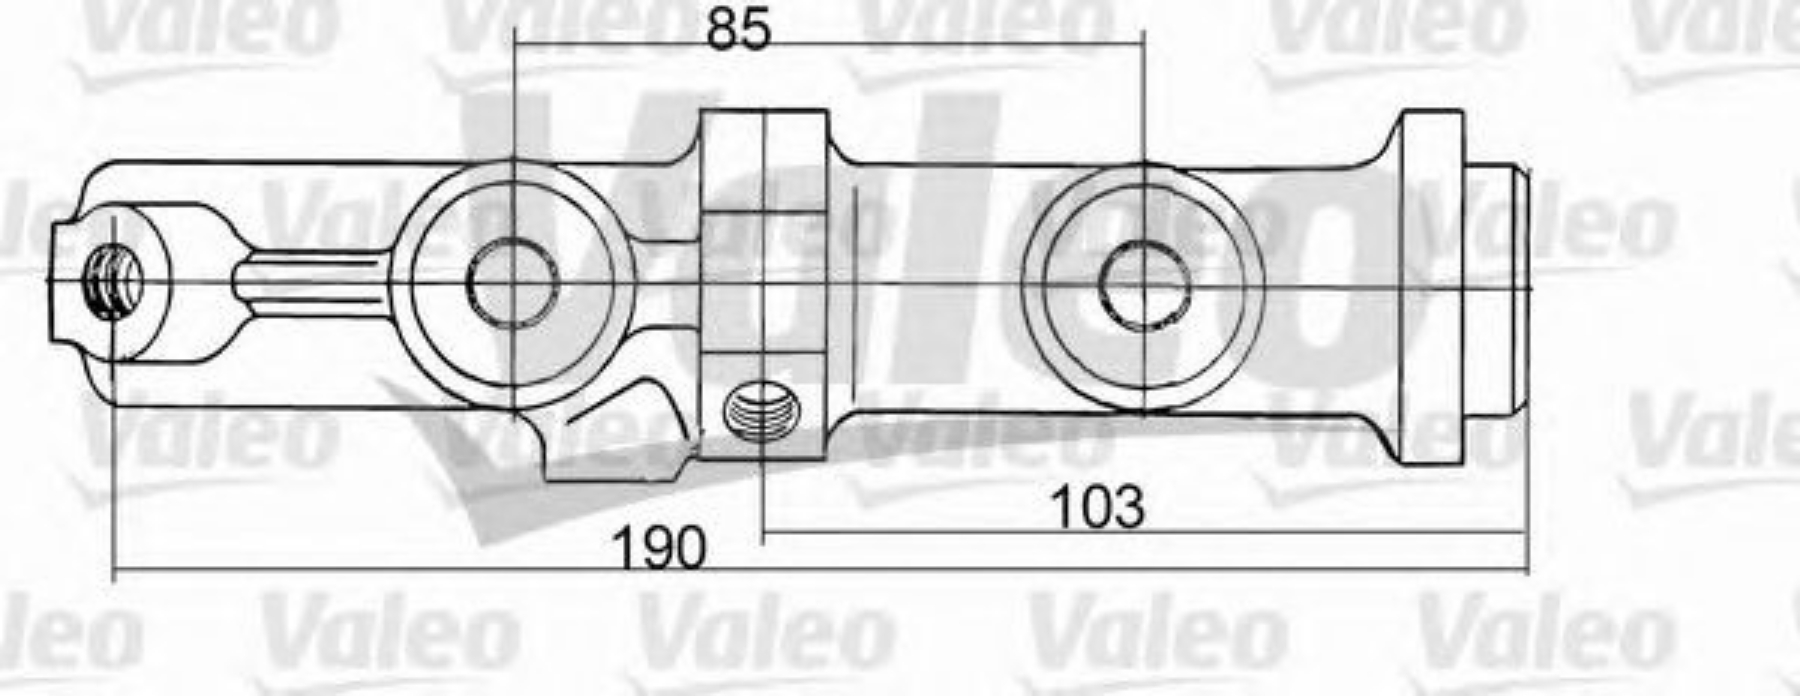 Smart Car 451 Engine Diagram. Smart. Auto Wiring Diagram